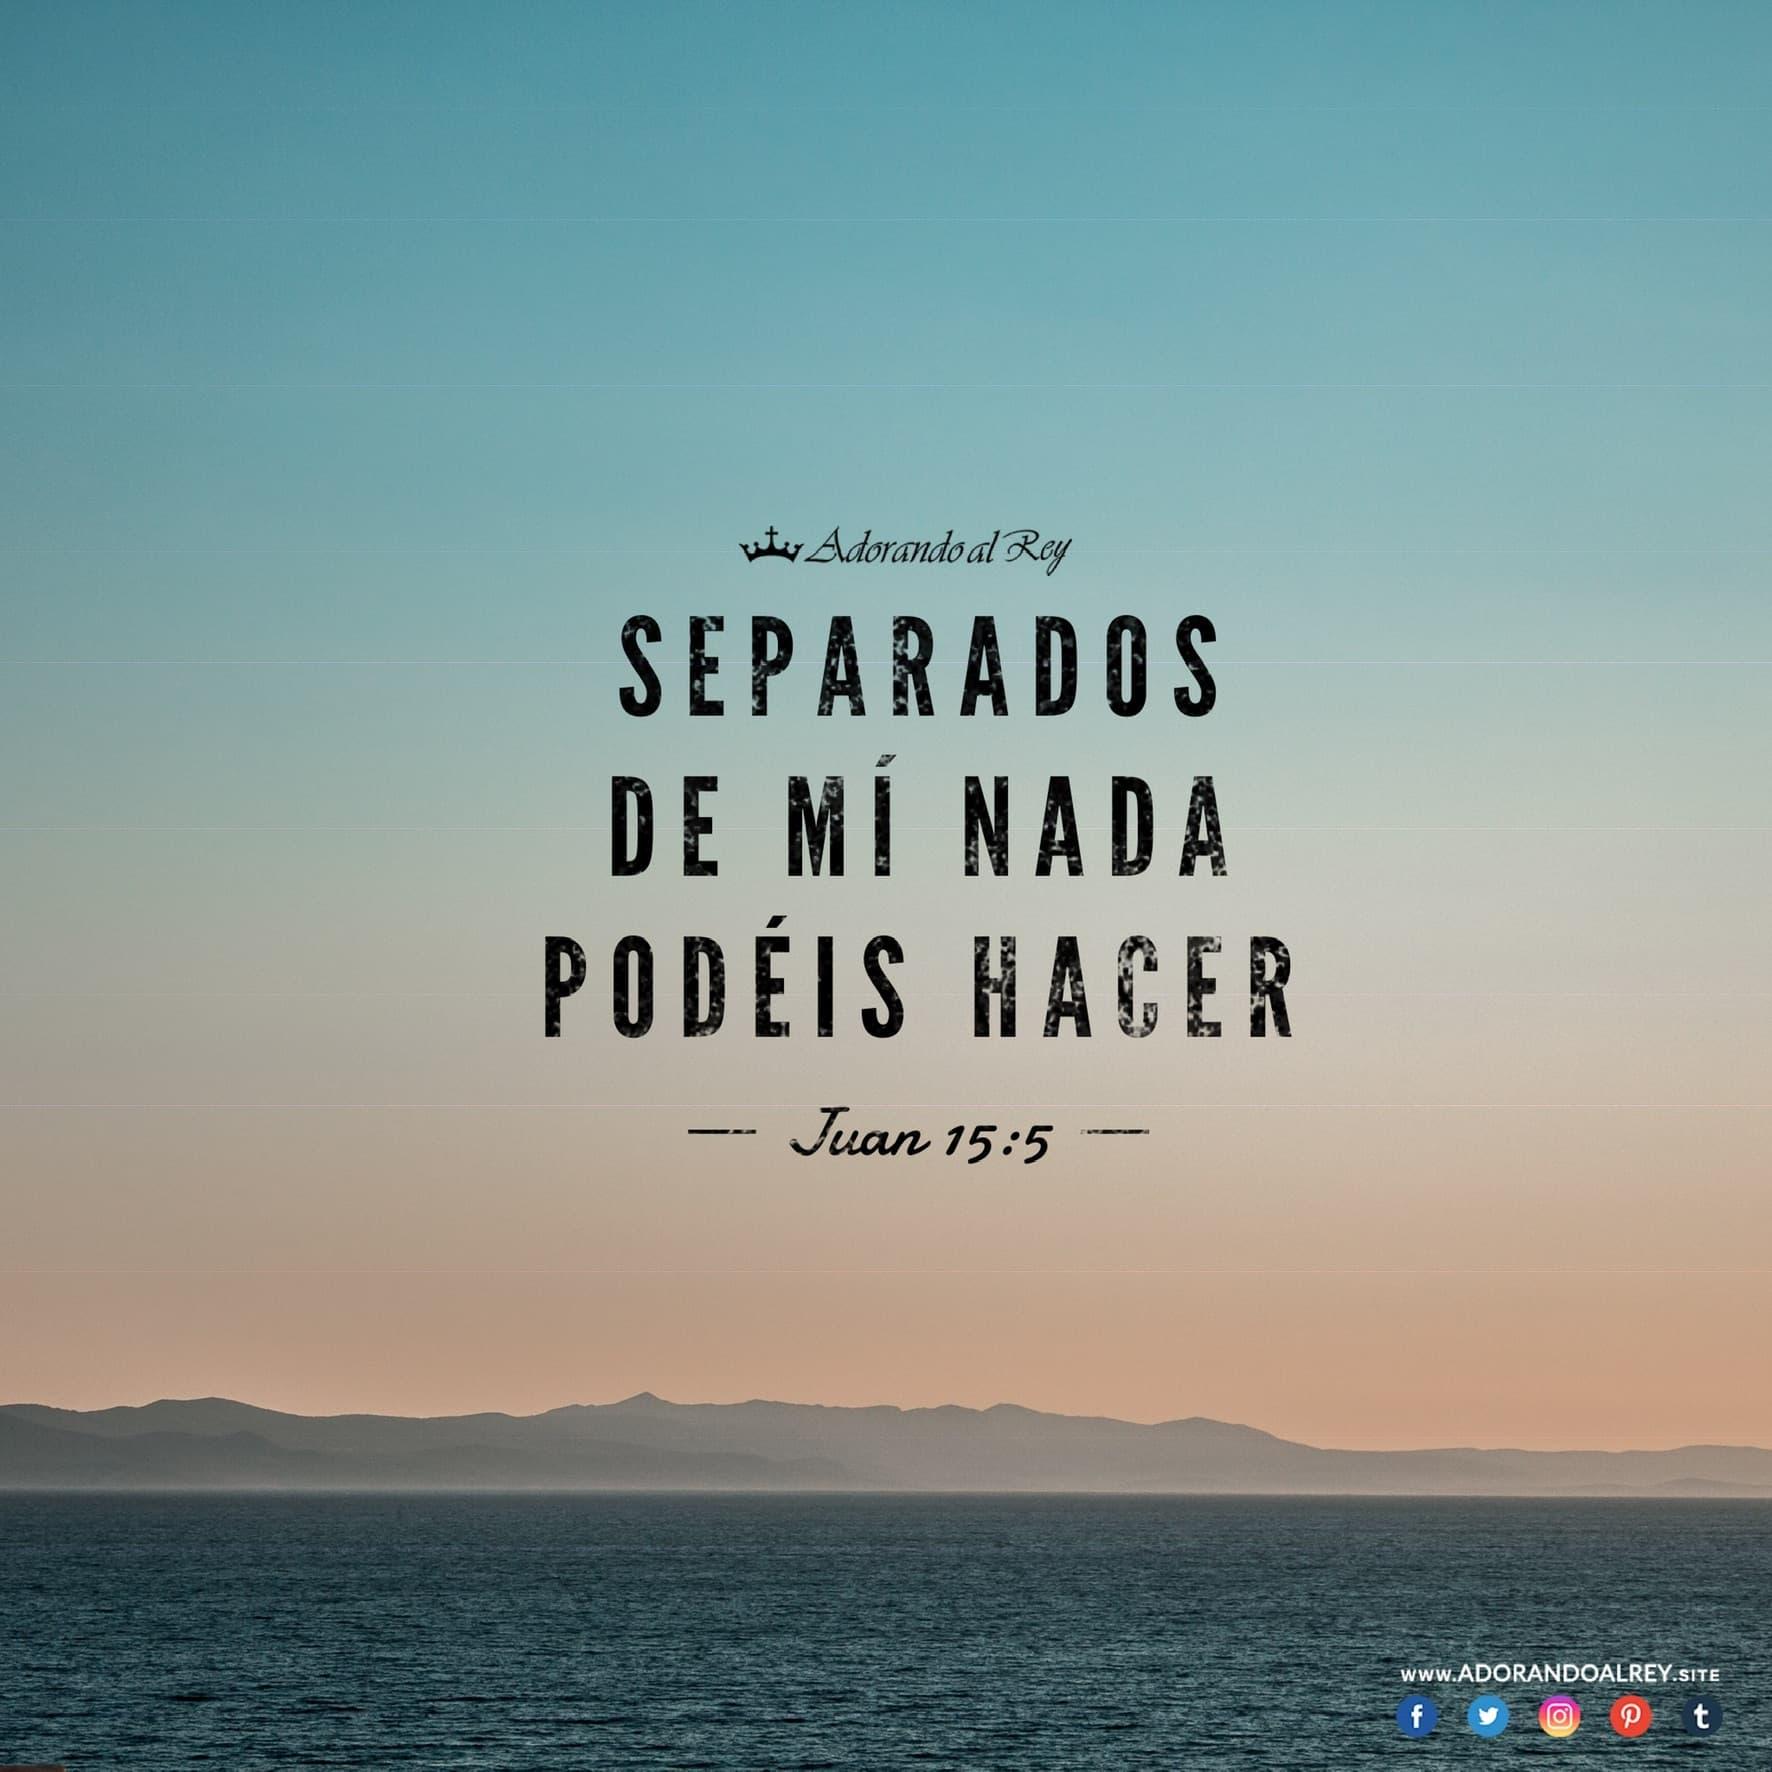 Juan 15:5